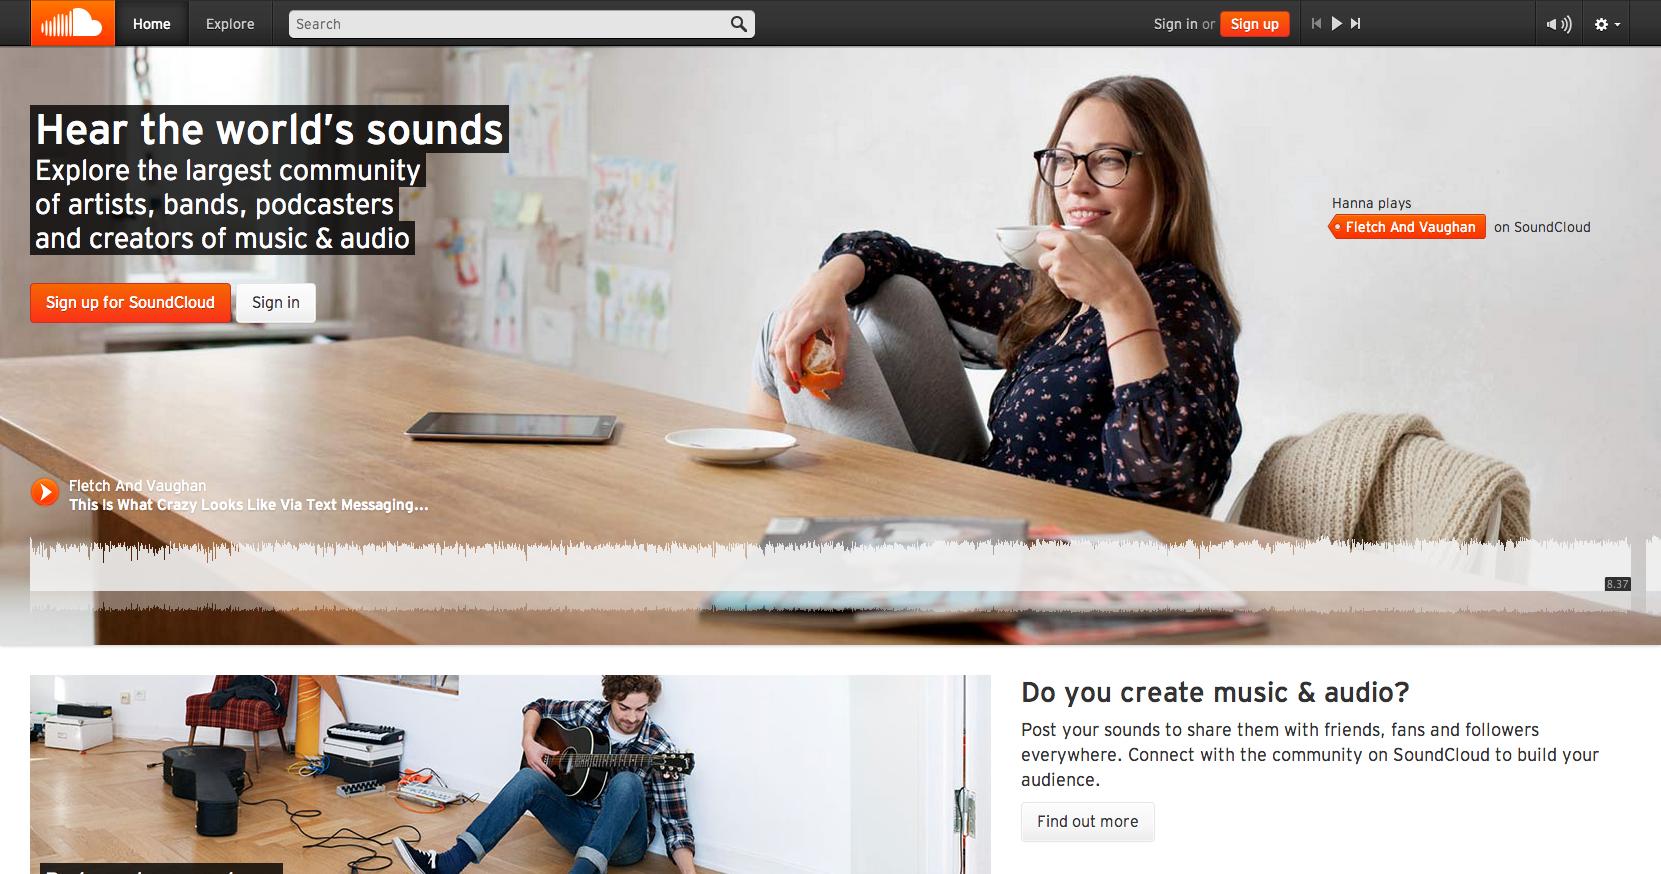 Soundcloud Homepage screenshot.